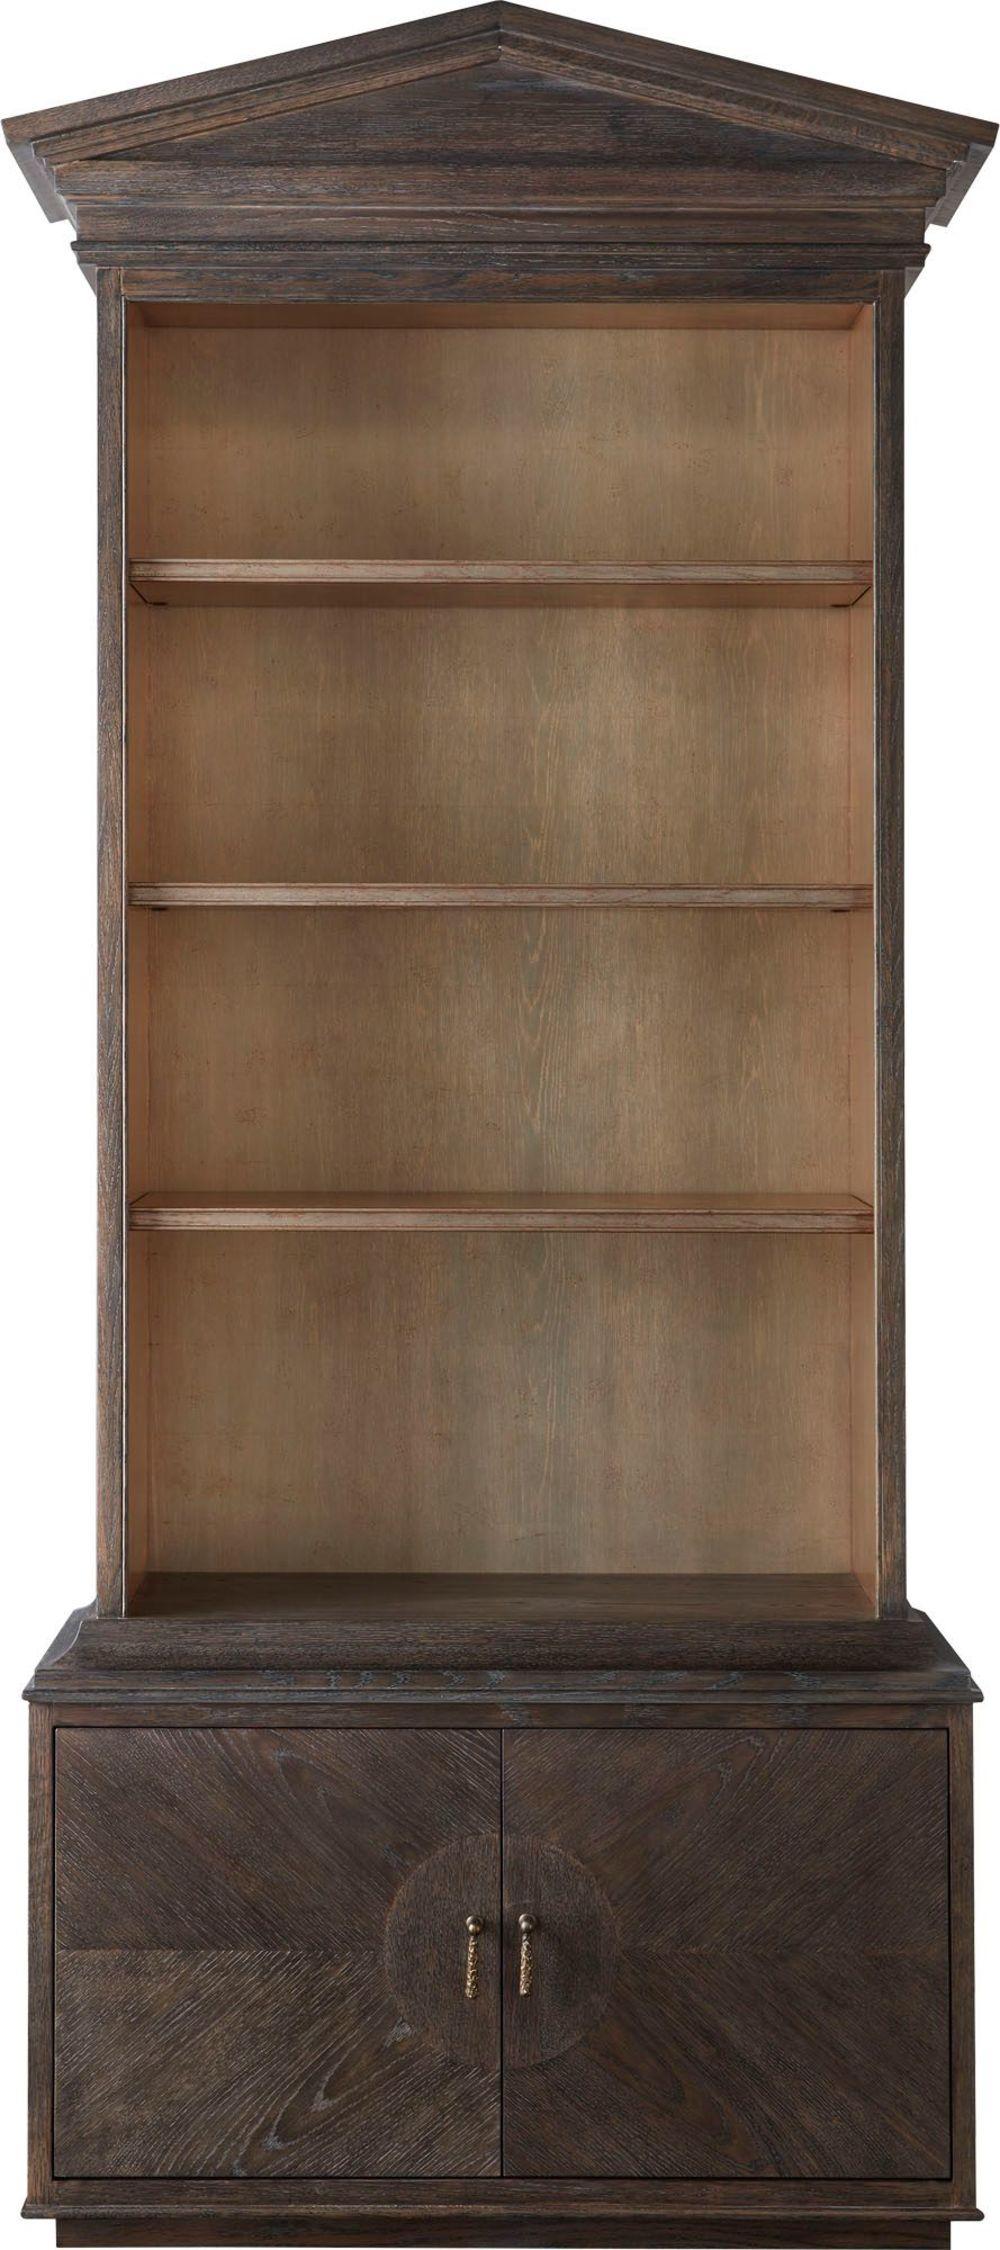 Baker Furniture - Thaddaeus Bookcase